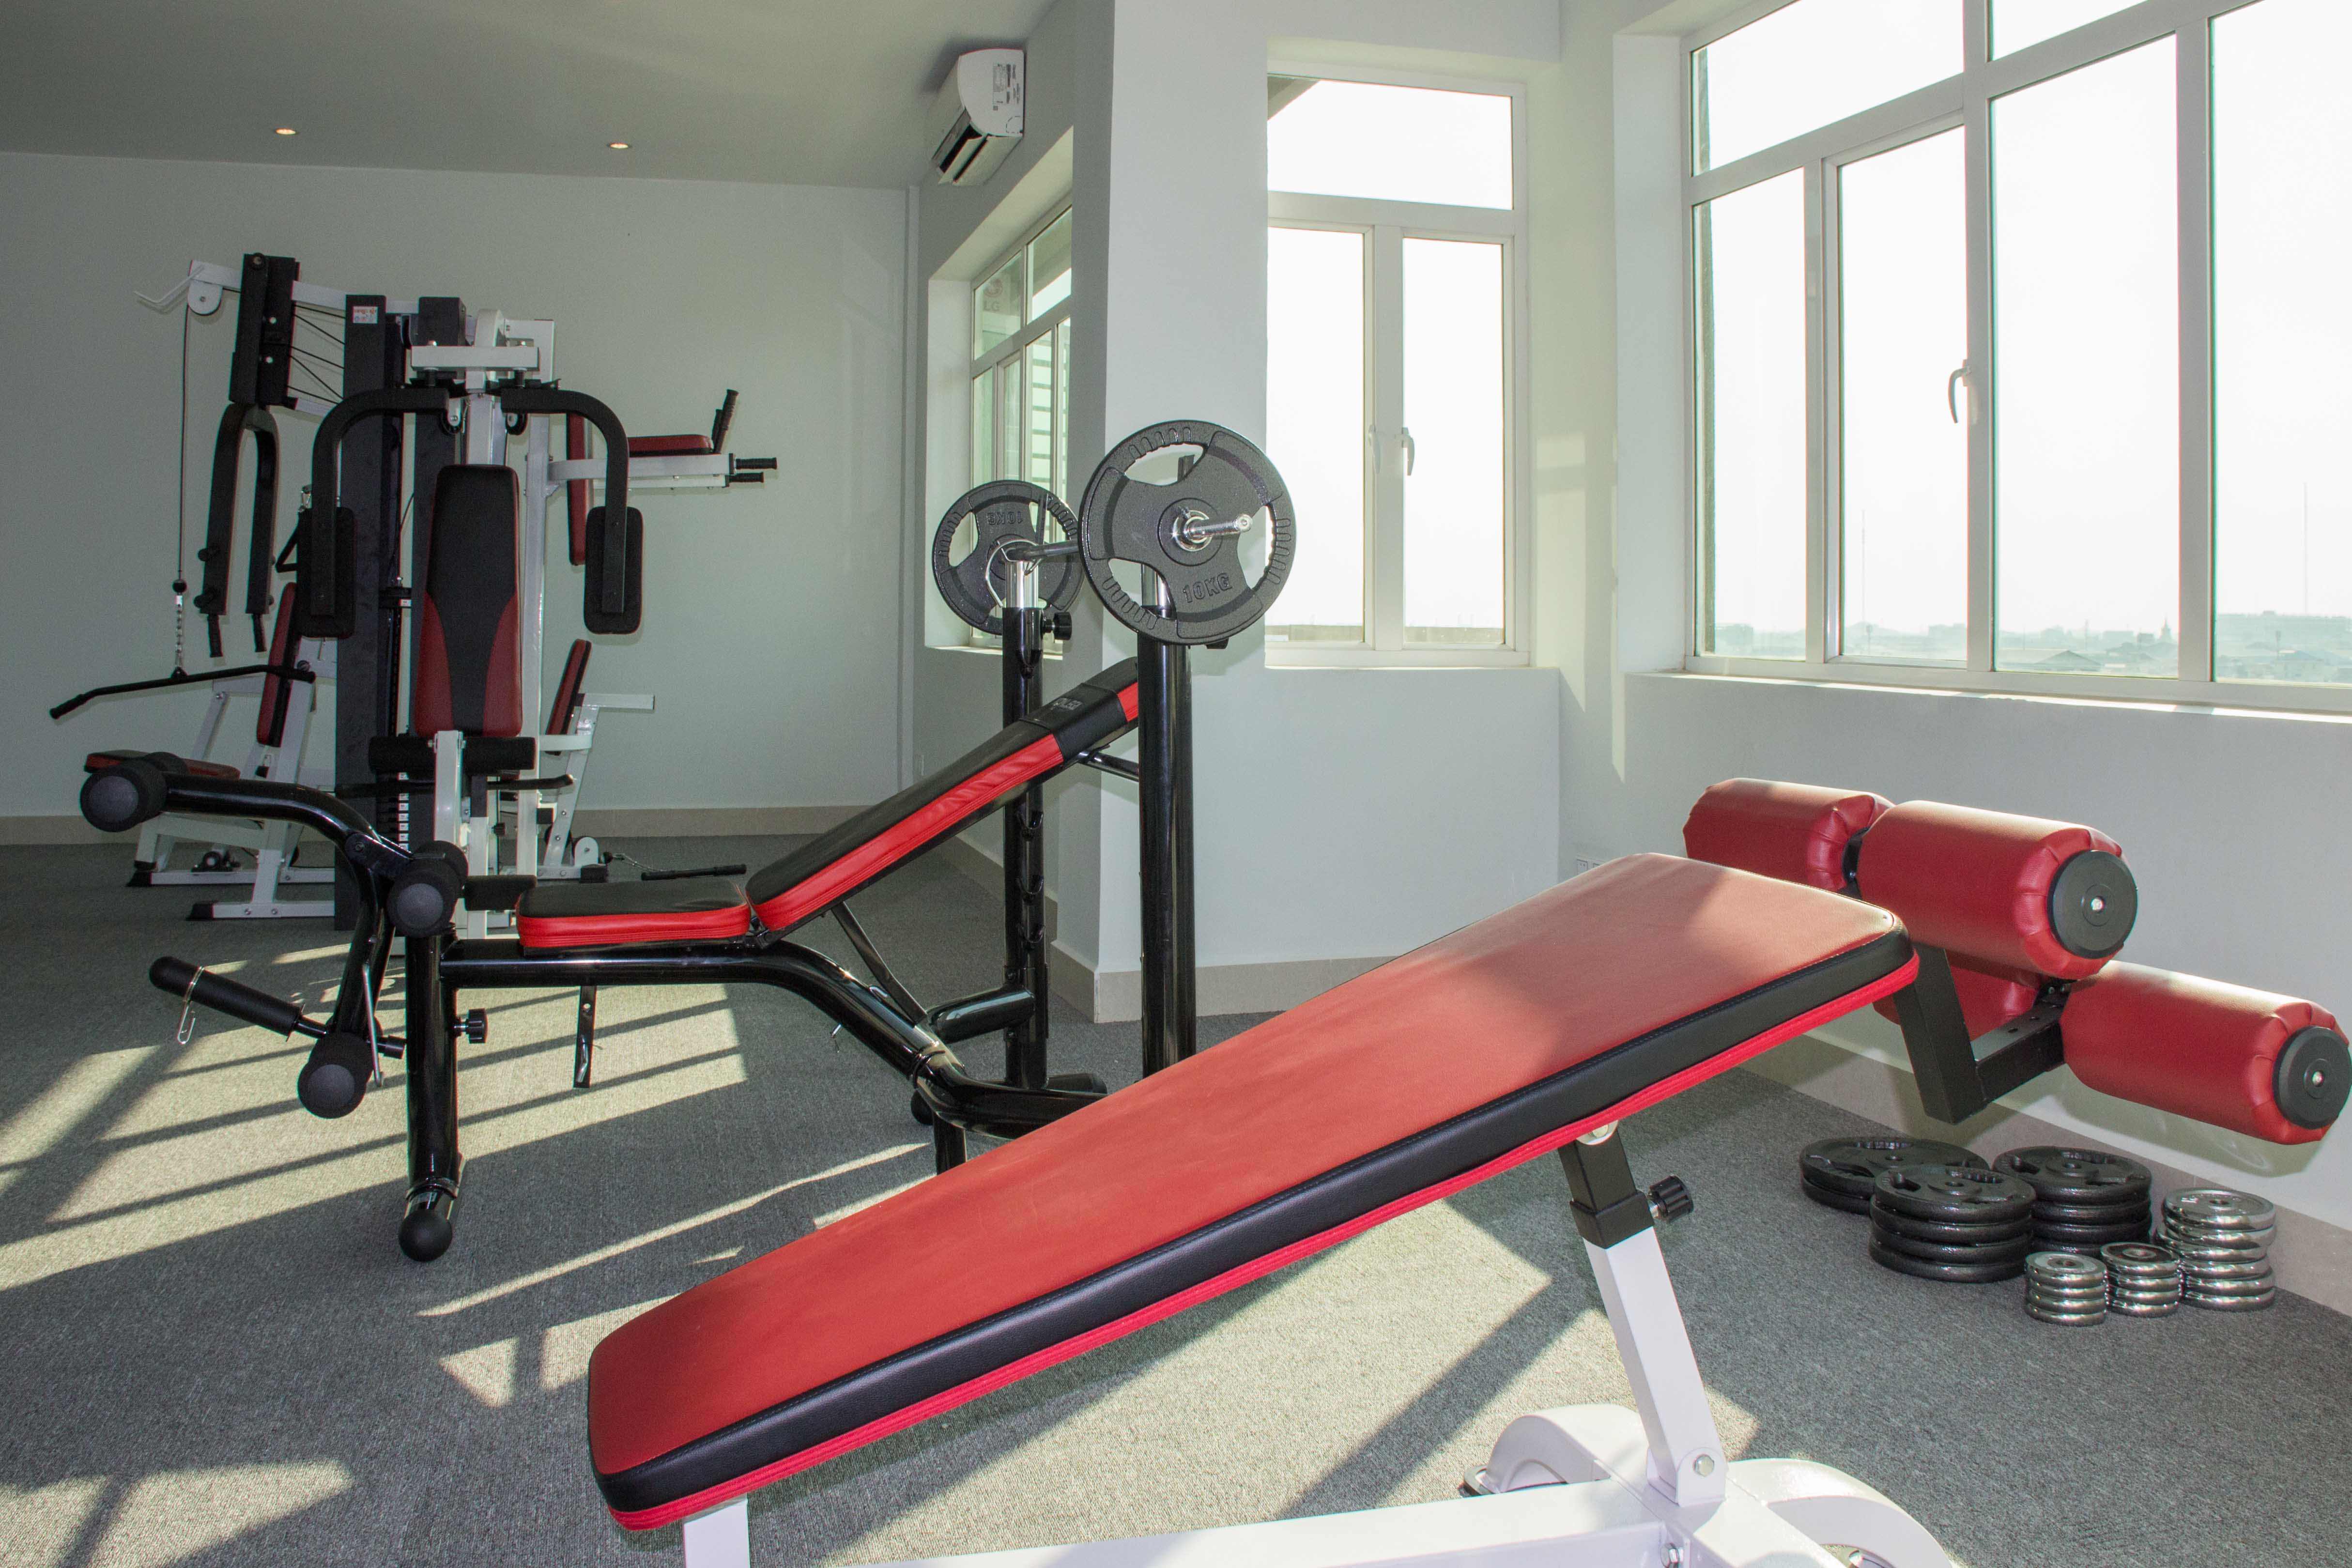 Gym | phnom penh | weekly